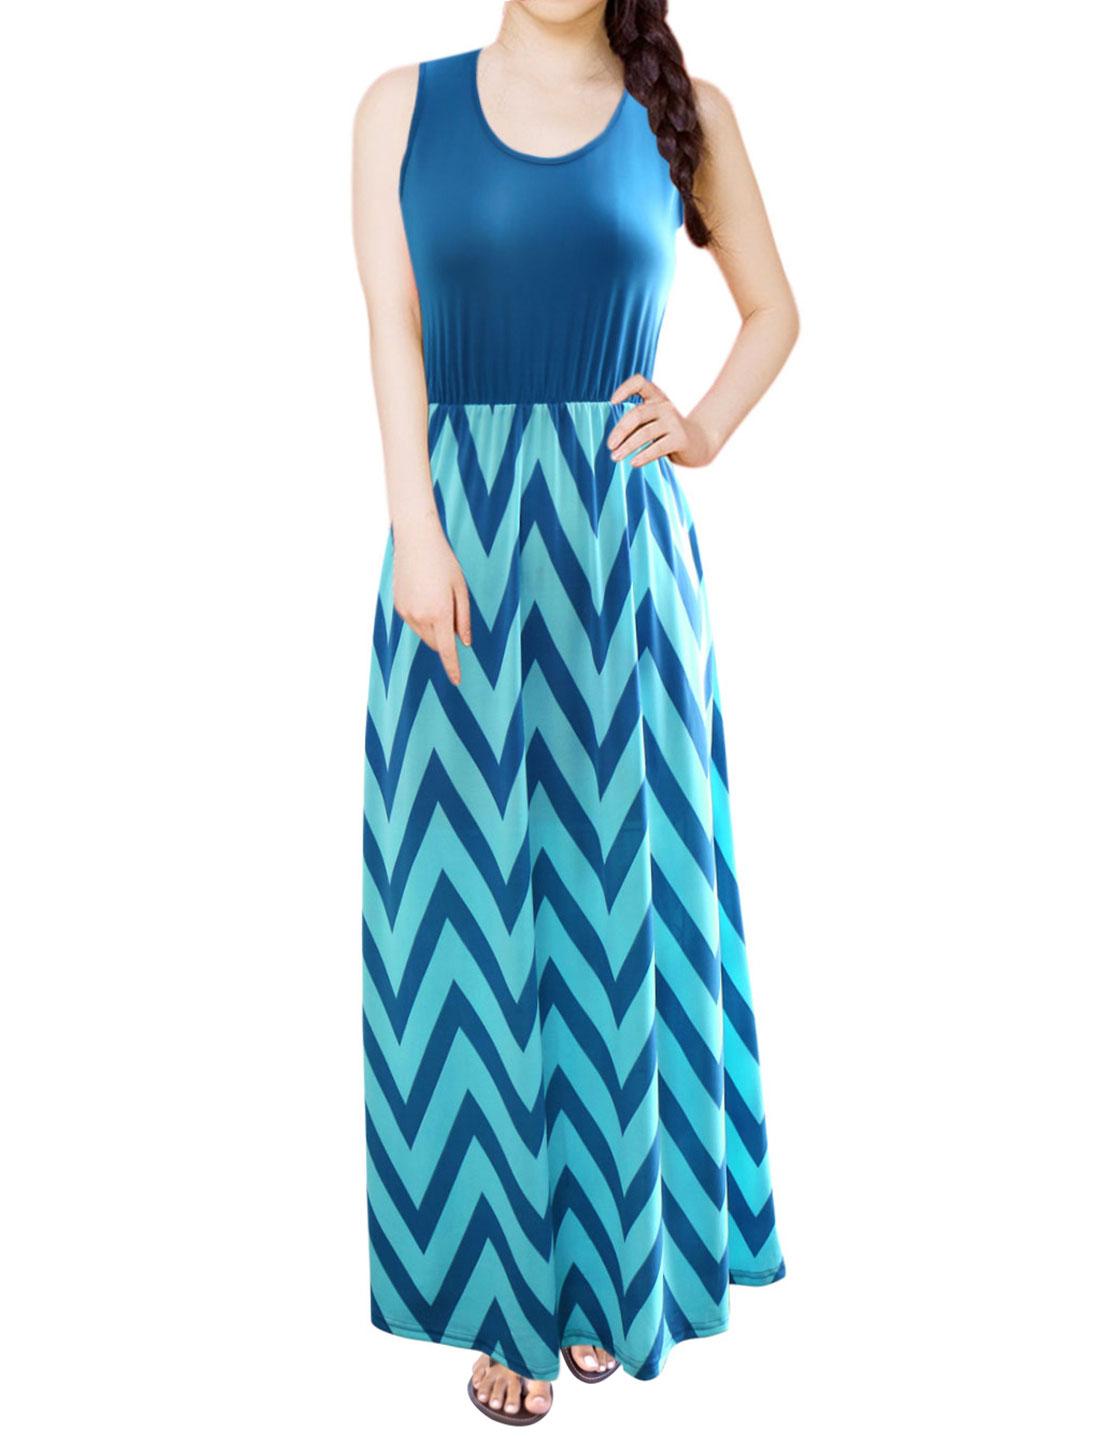 Women Sleeveless Empire Waist Chevron Maxi Dress Dark Blue L